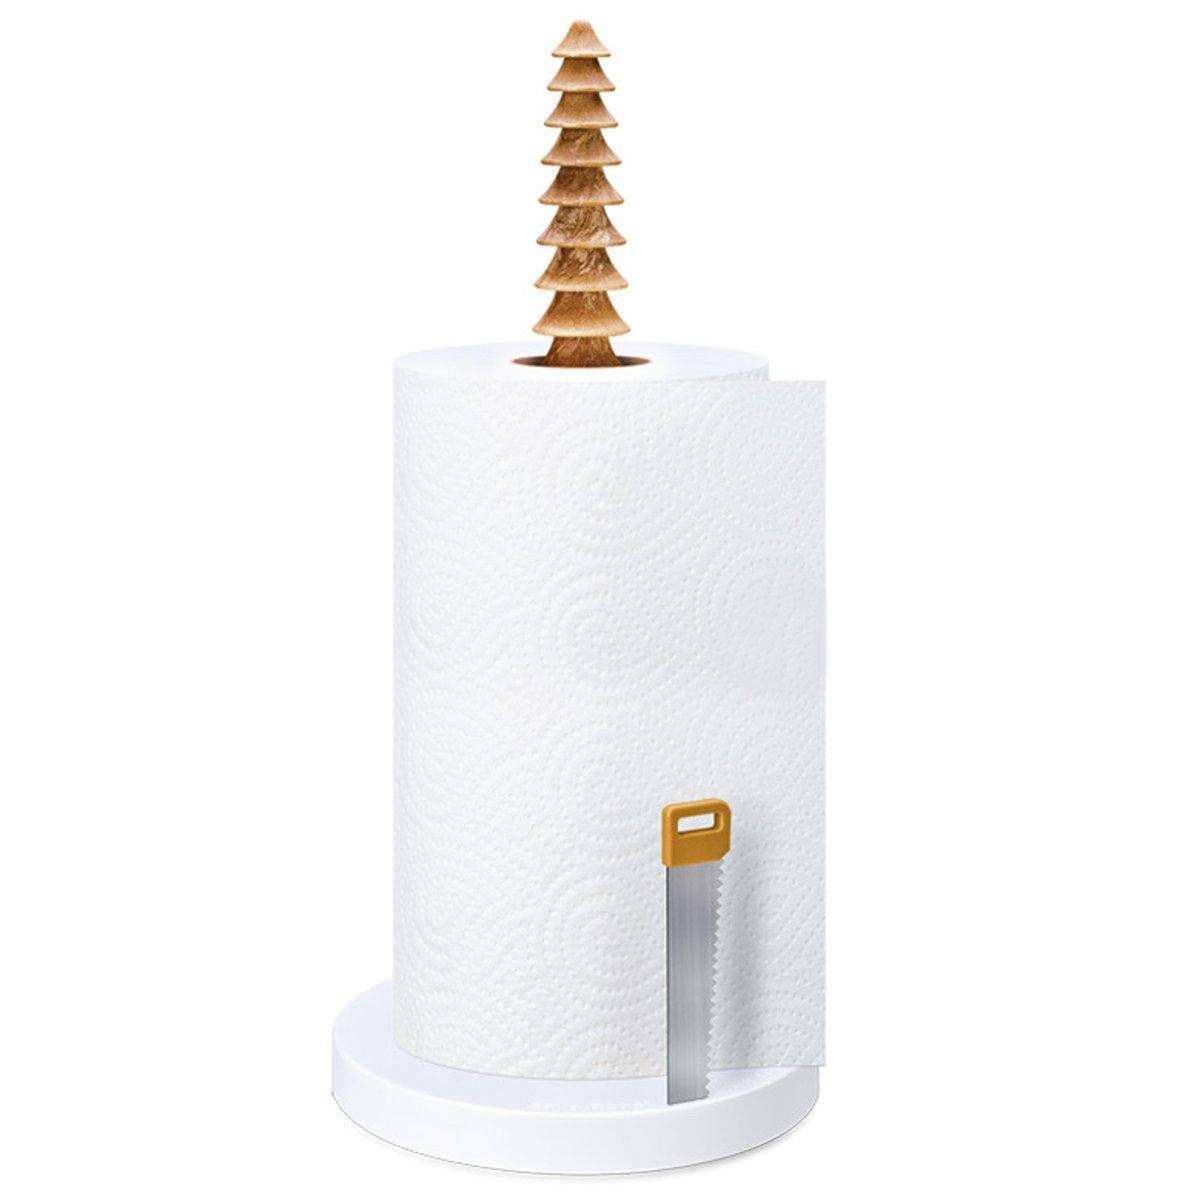 Keuken Keukenrolhouder Vrijstaand toiletpapier Roll Dispenser Opslag - 1